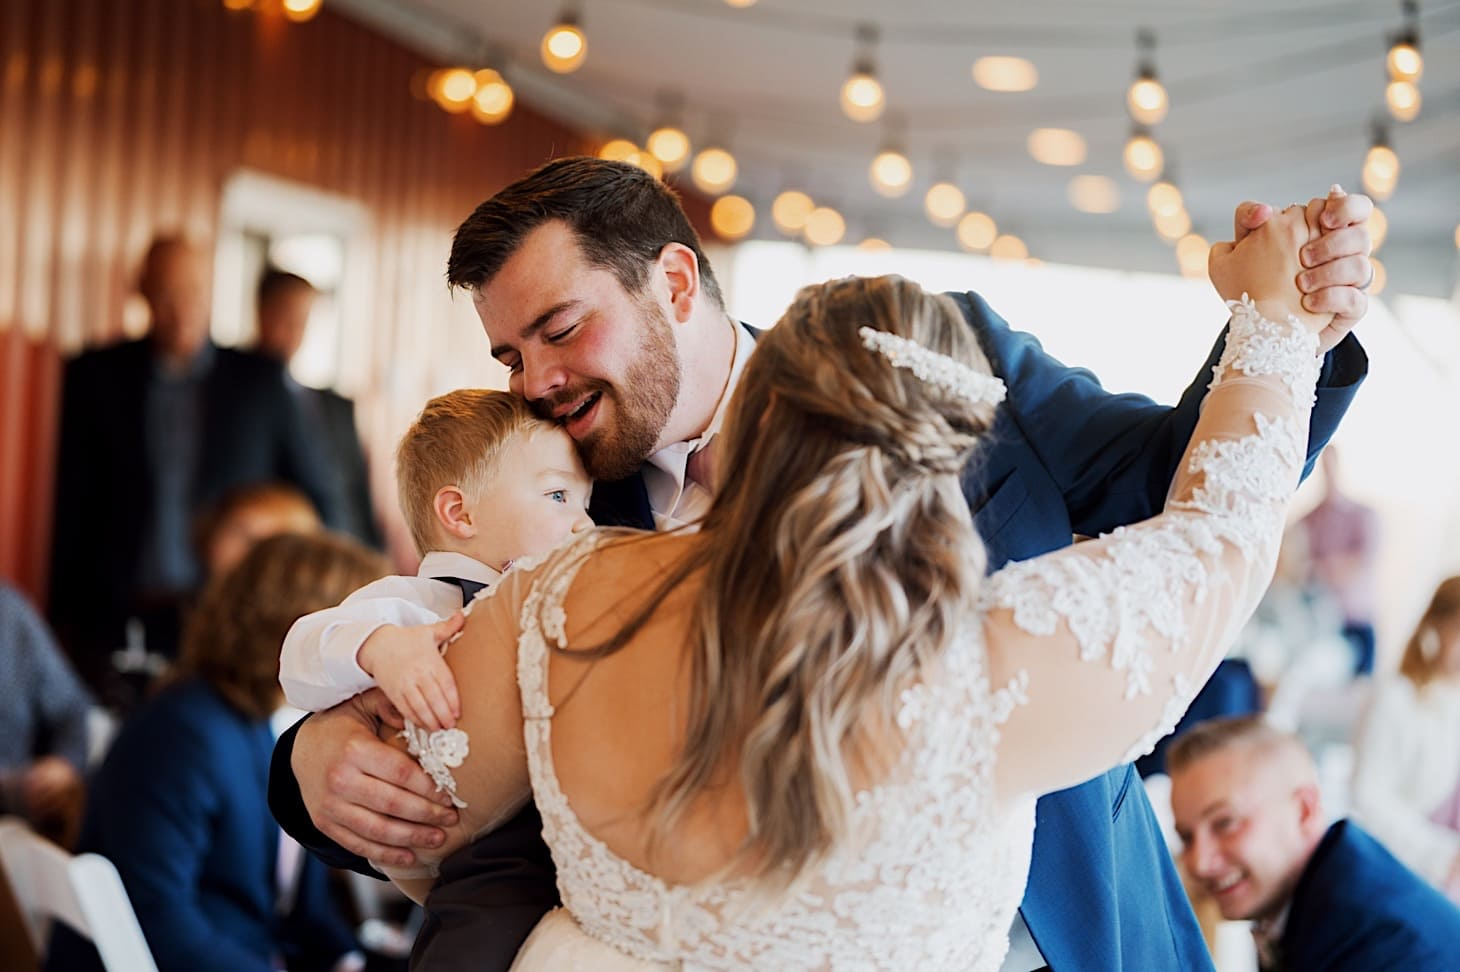 wedding dance photos red acre barn iowa